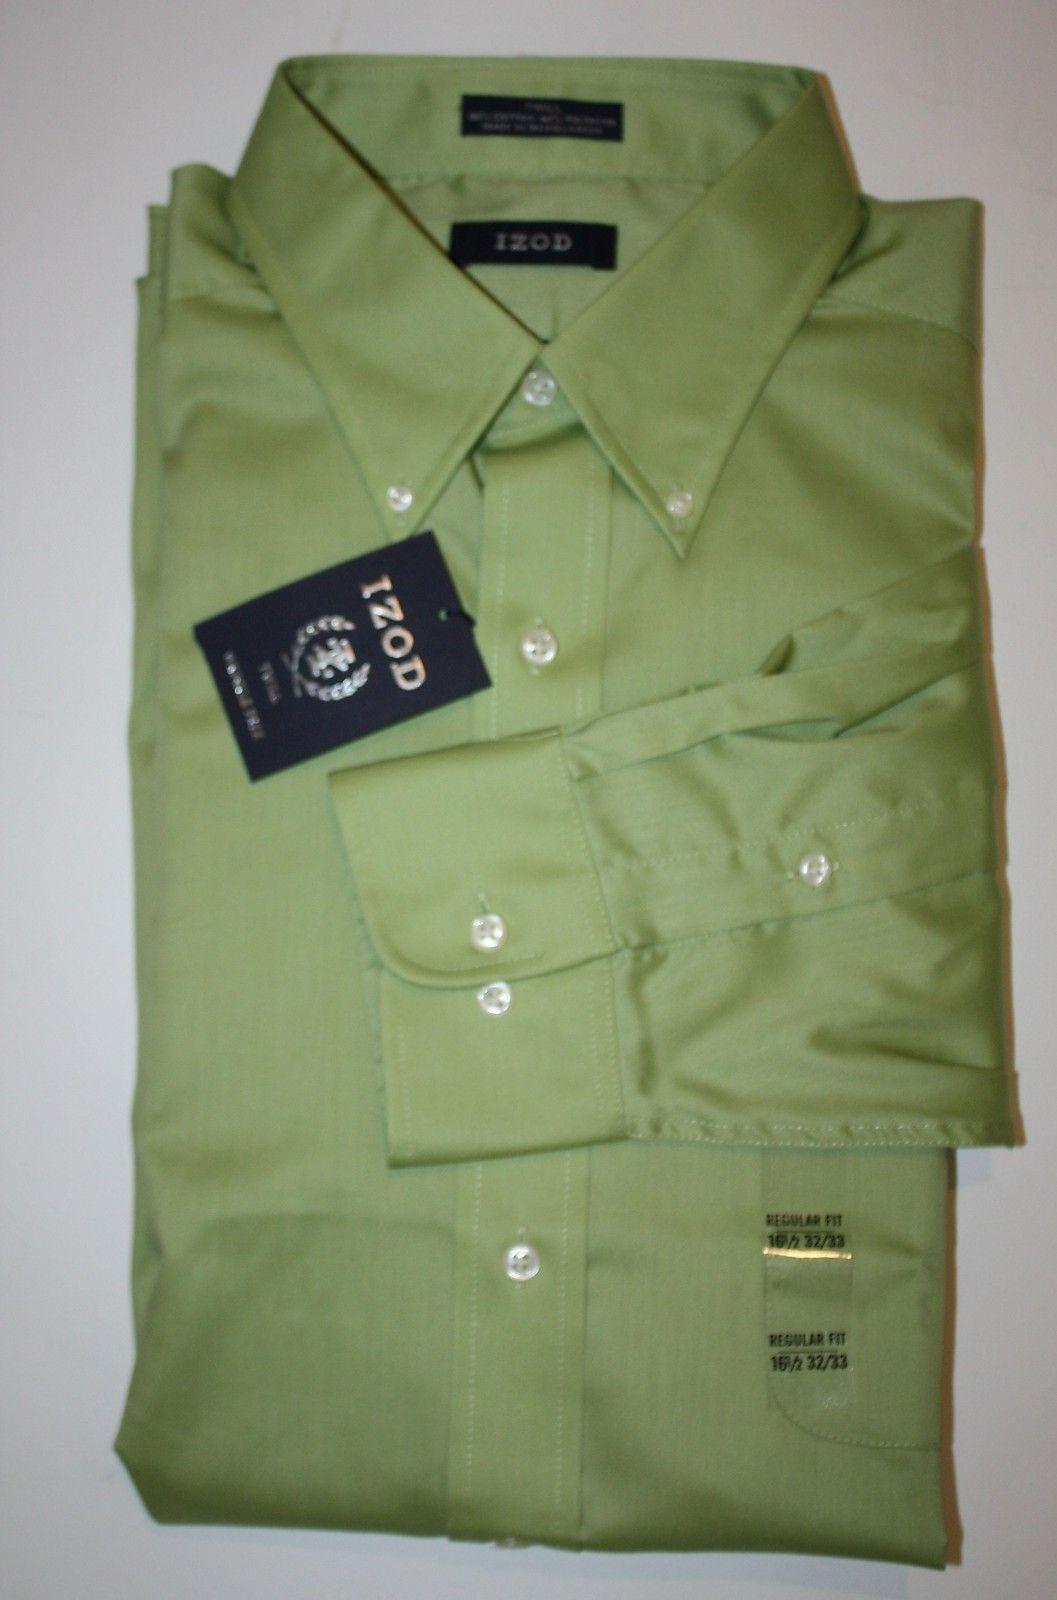 Izod Mens Long-Sleeve Regular-Fit Wrinkle-Free Checked Shirt